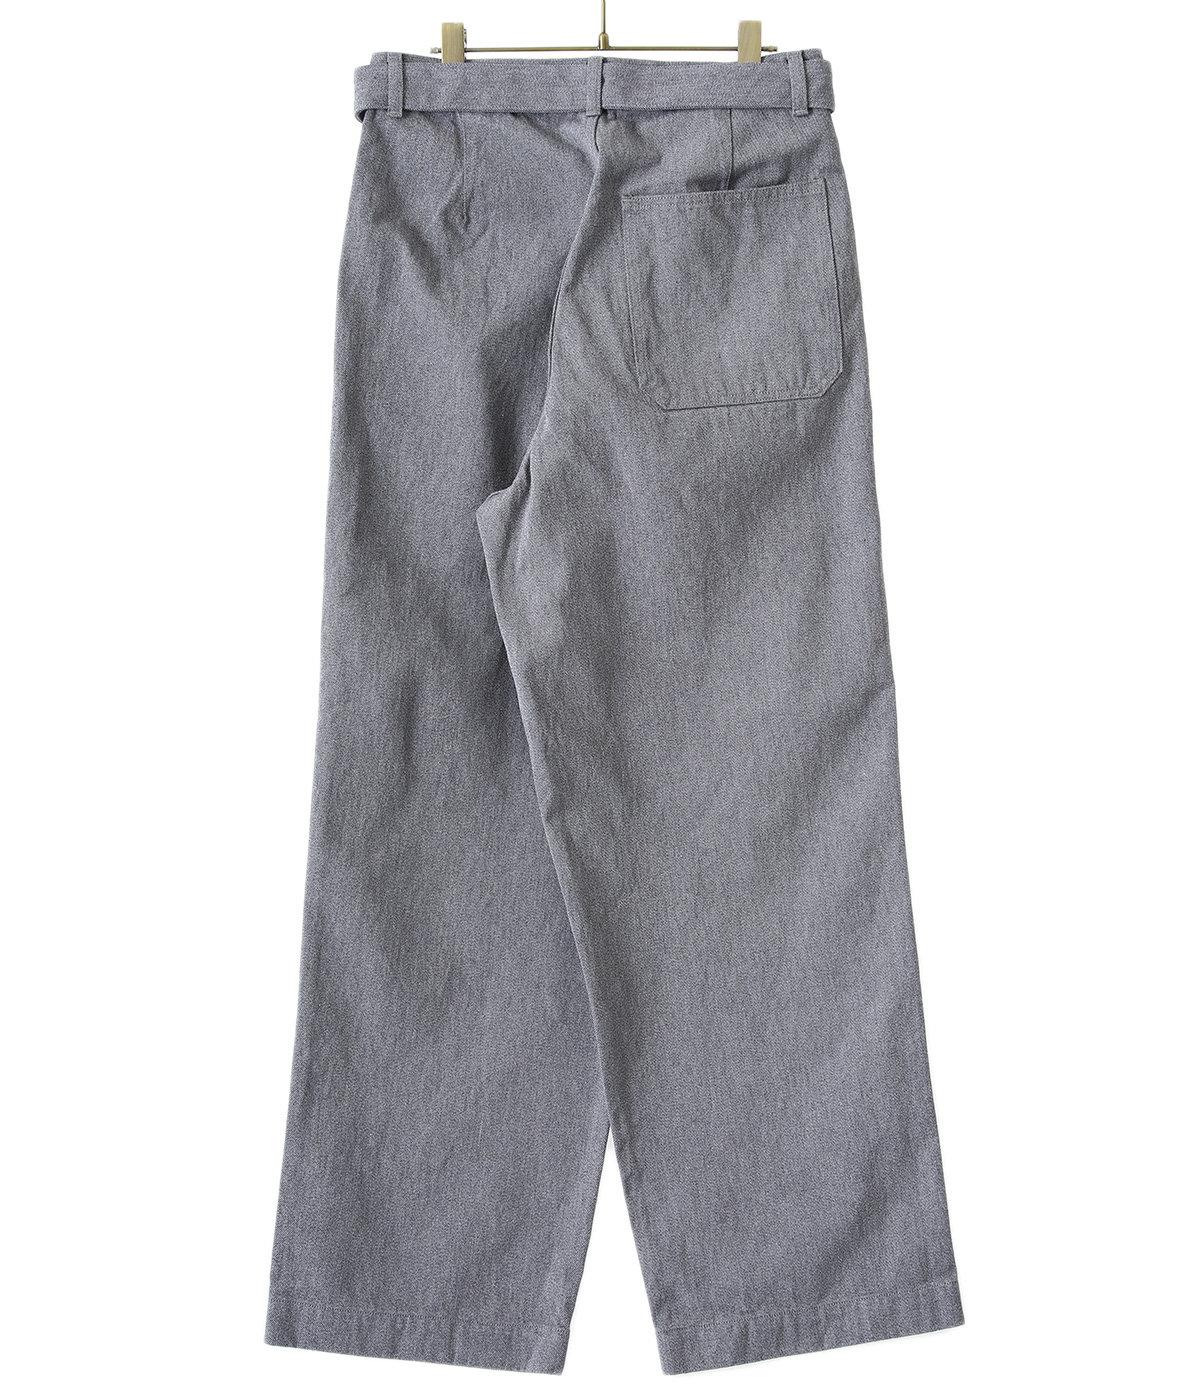 Colorfast Denim Belted Pants